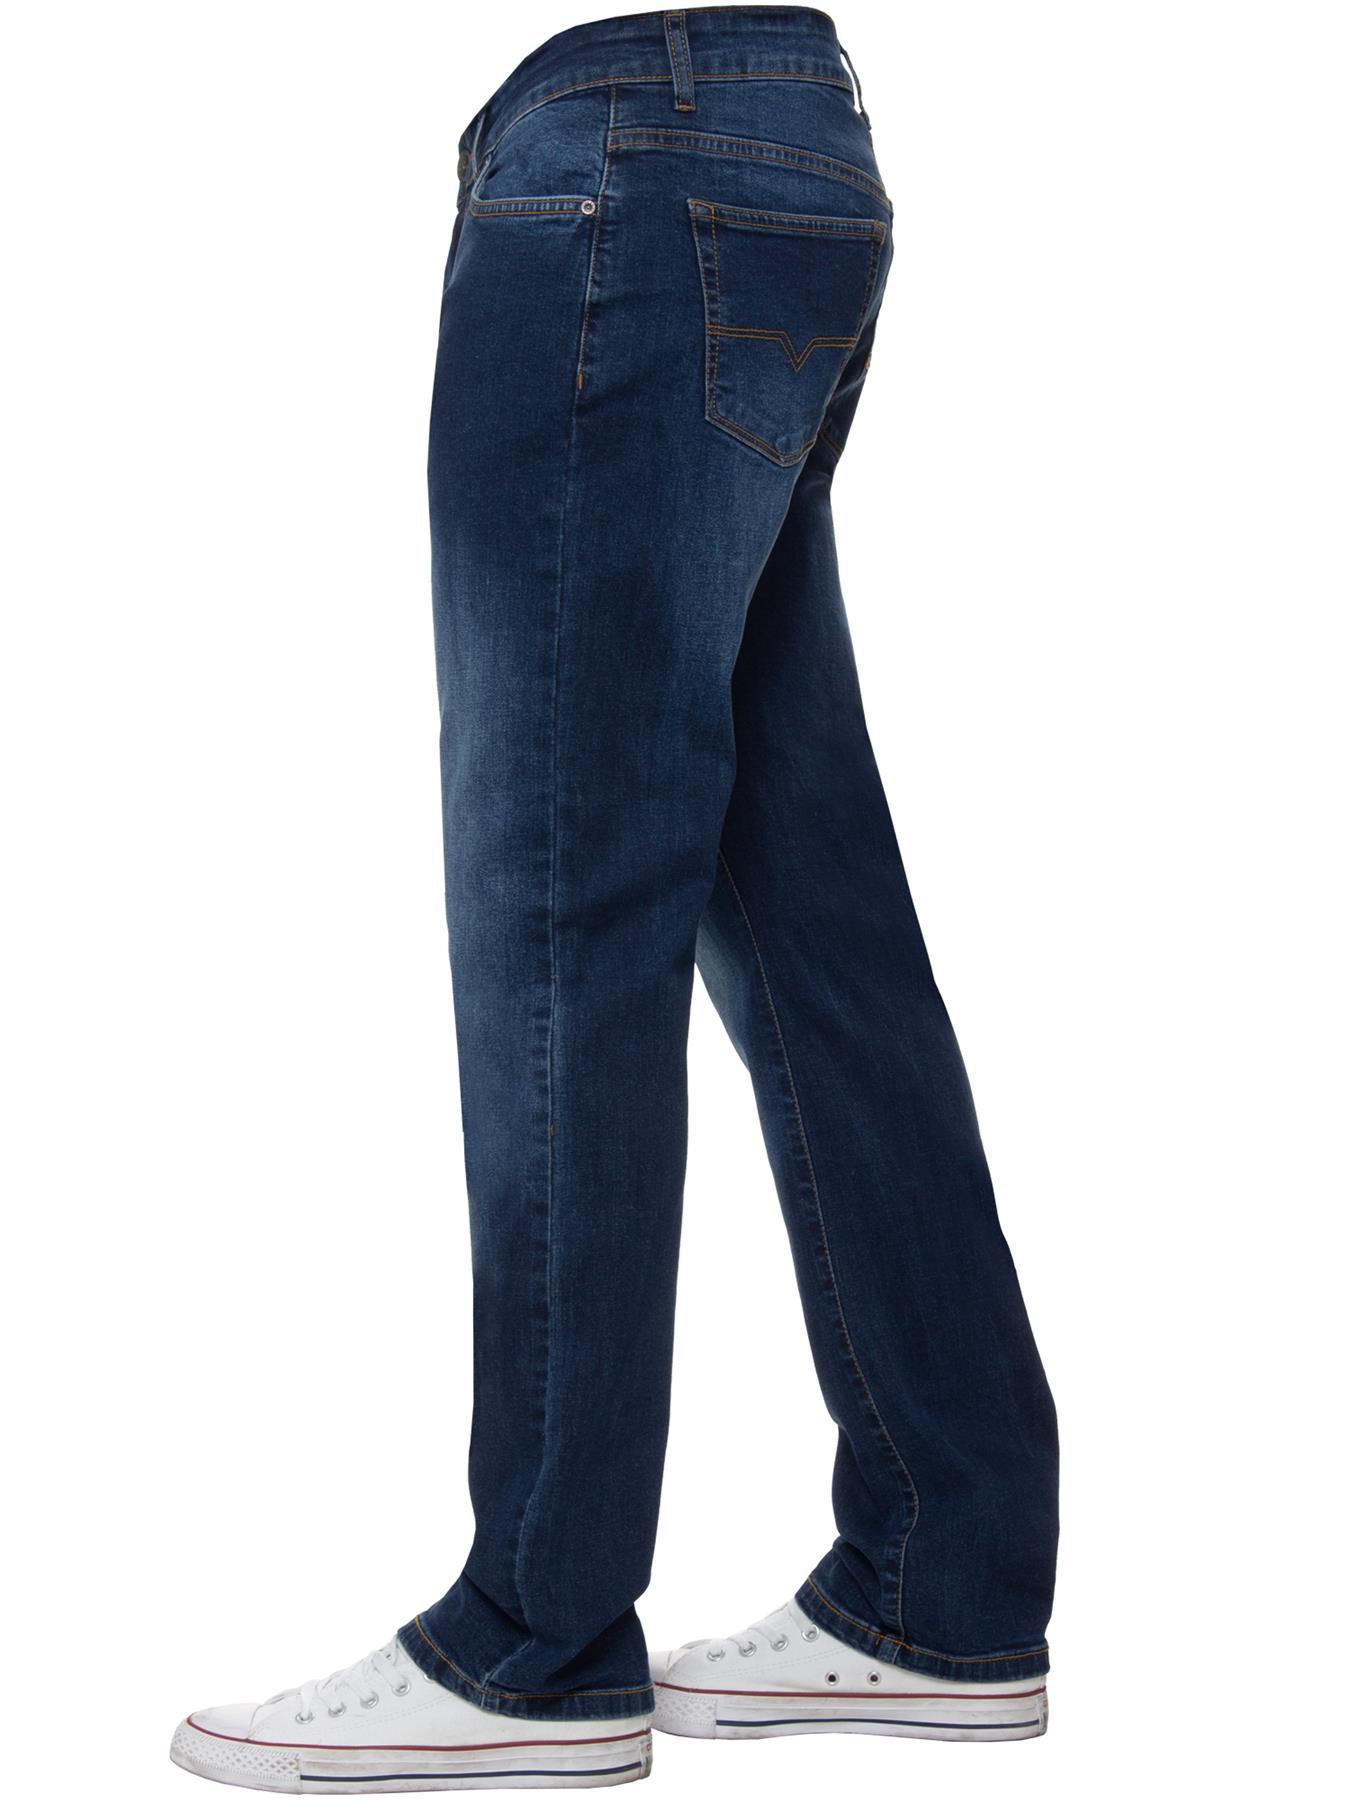 Para-Hombre-Pierna-Recta-Bootcut-Stretch-Denim-Regulares-Pantalon-de-trabajo-Kruze-Todas-Cinturas miniatura 44